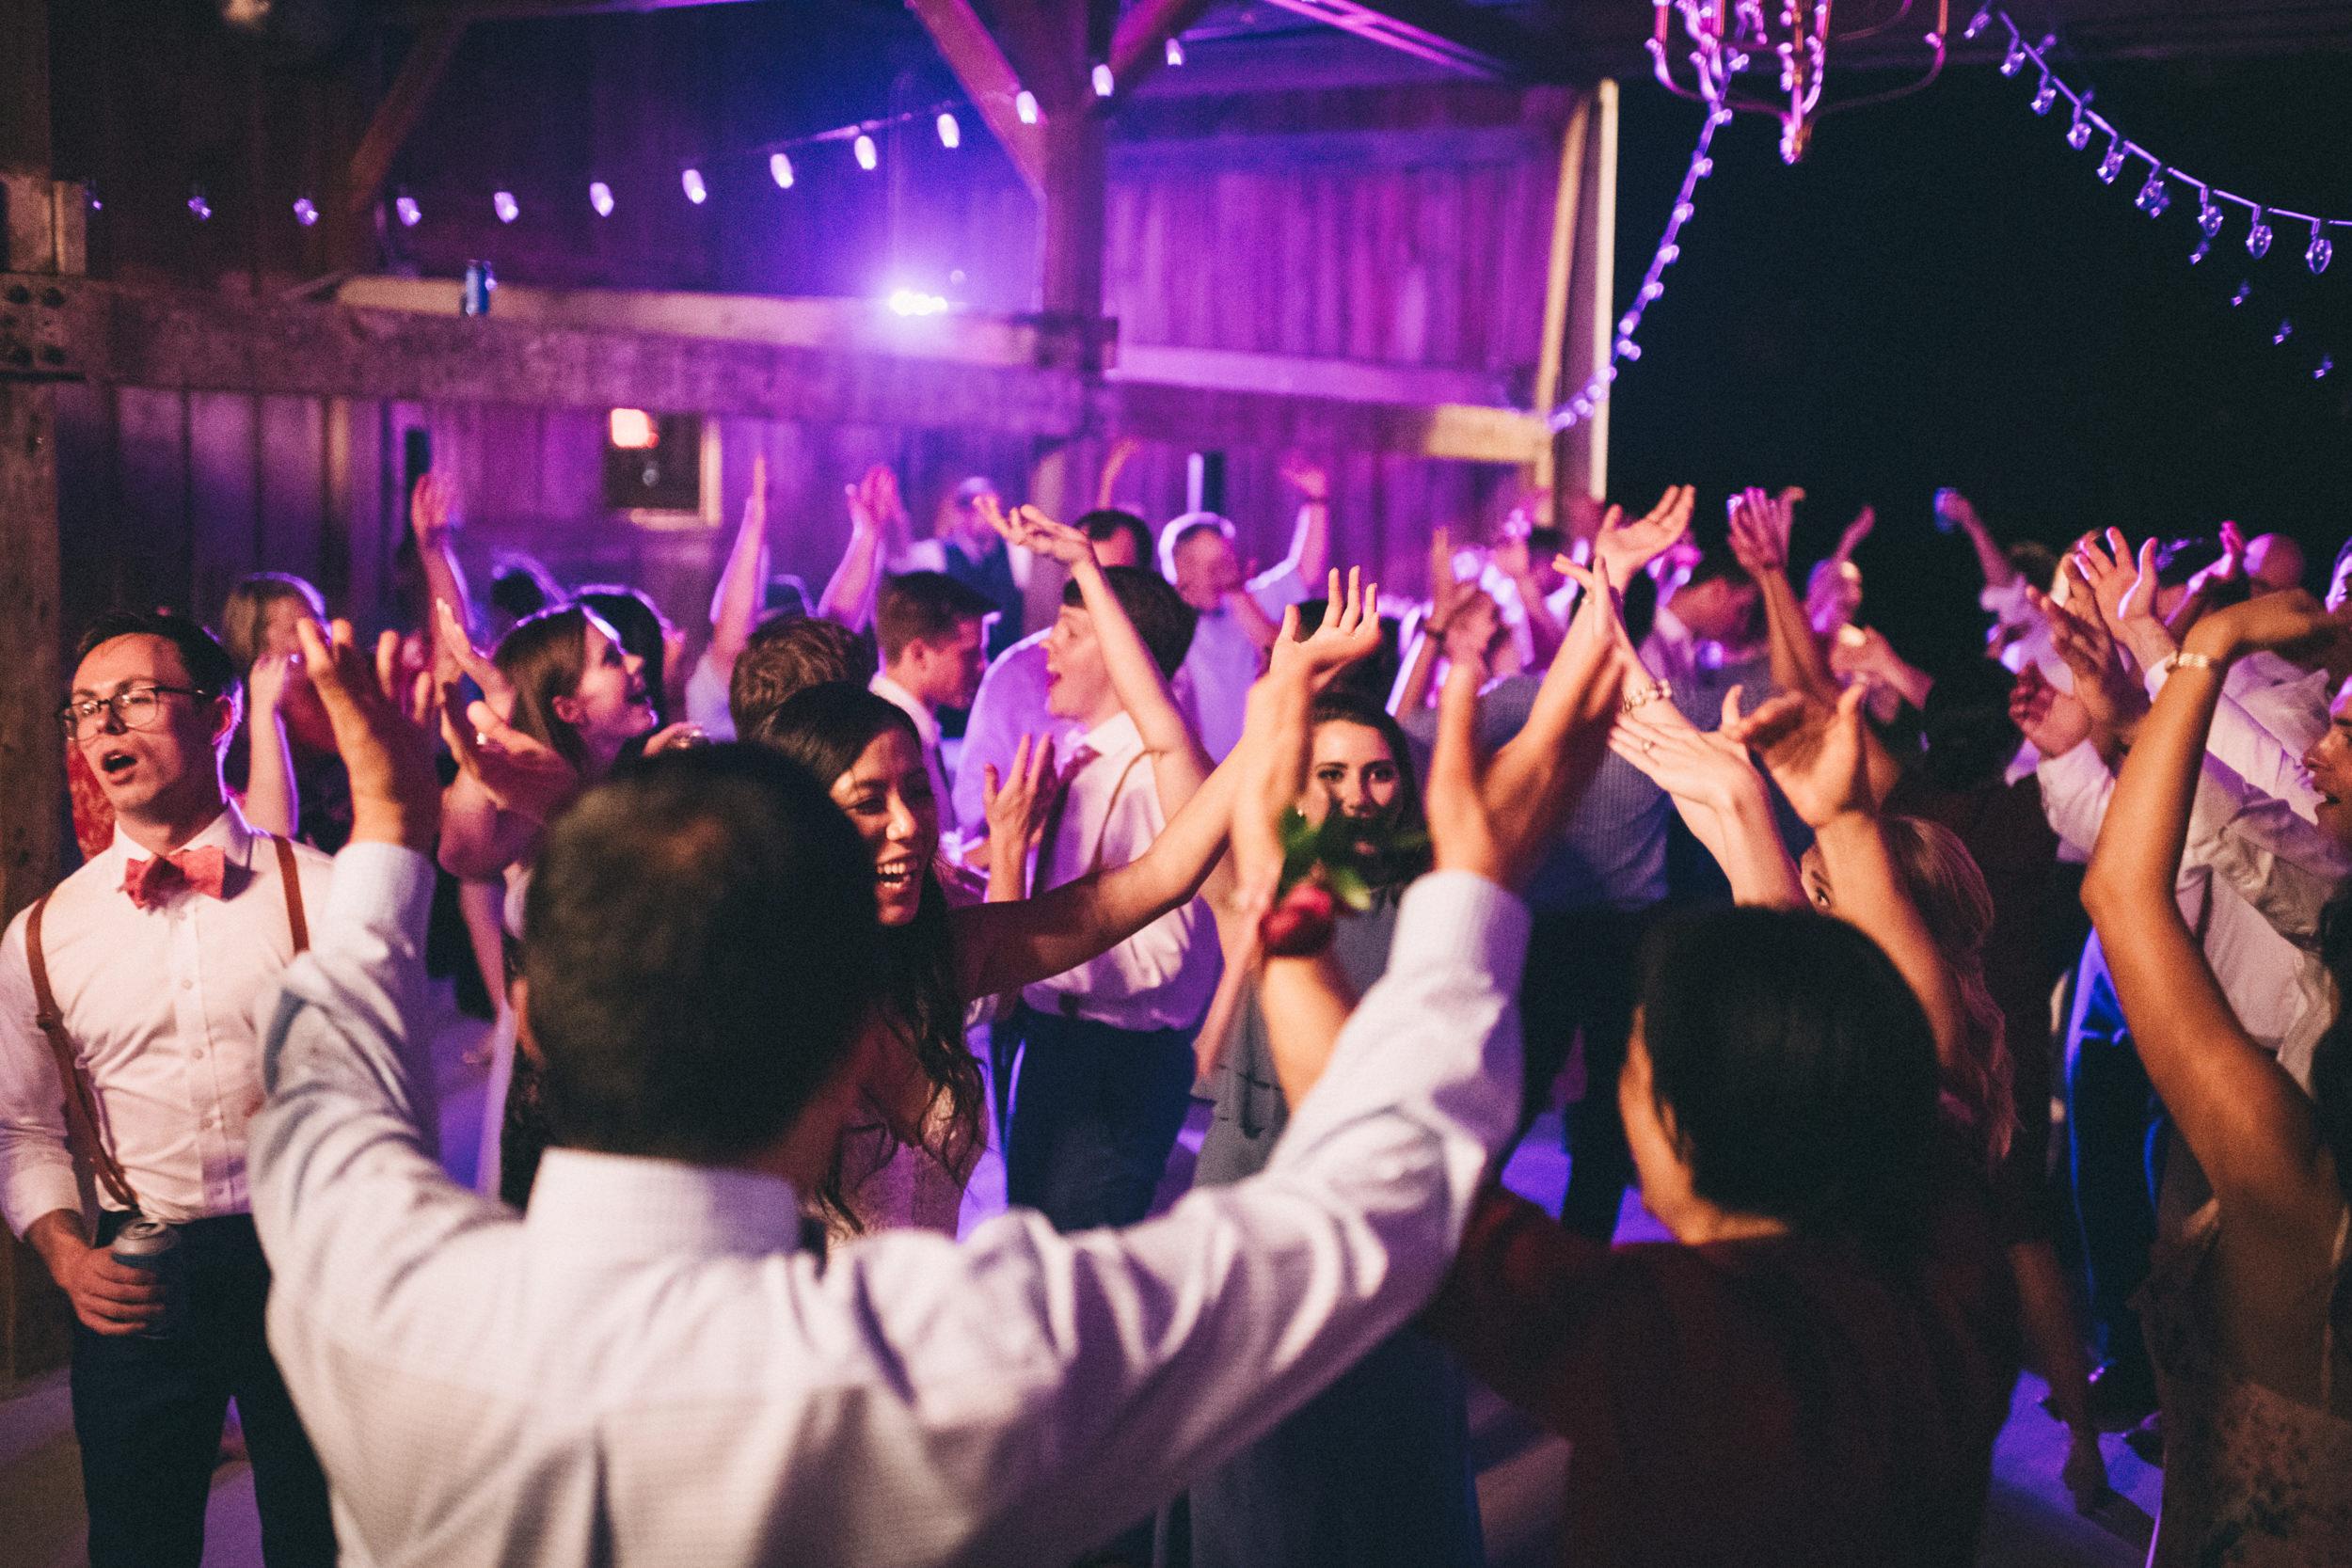 Louisville-Kentucky-Wedding-and-Elopement-Photographer-Sarah-Katherine-Davis-Photography-Summer-Jewel-Toned-Wedding-Chineese-Tea-Ceremony-Warrenwood-Manor-Danville-1092.jpg